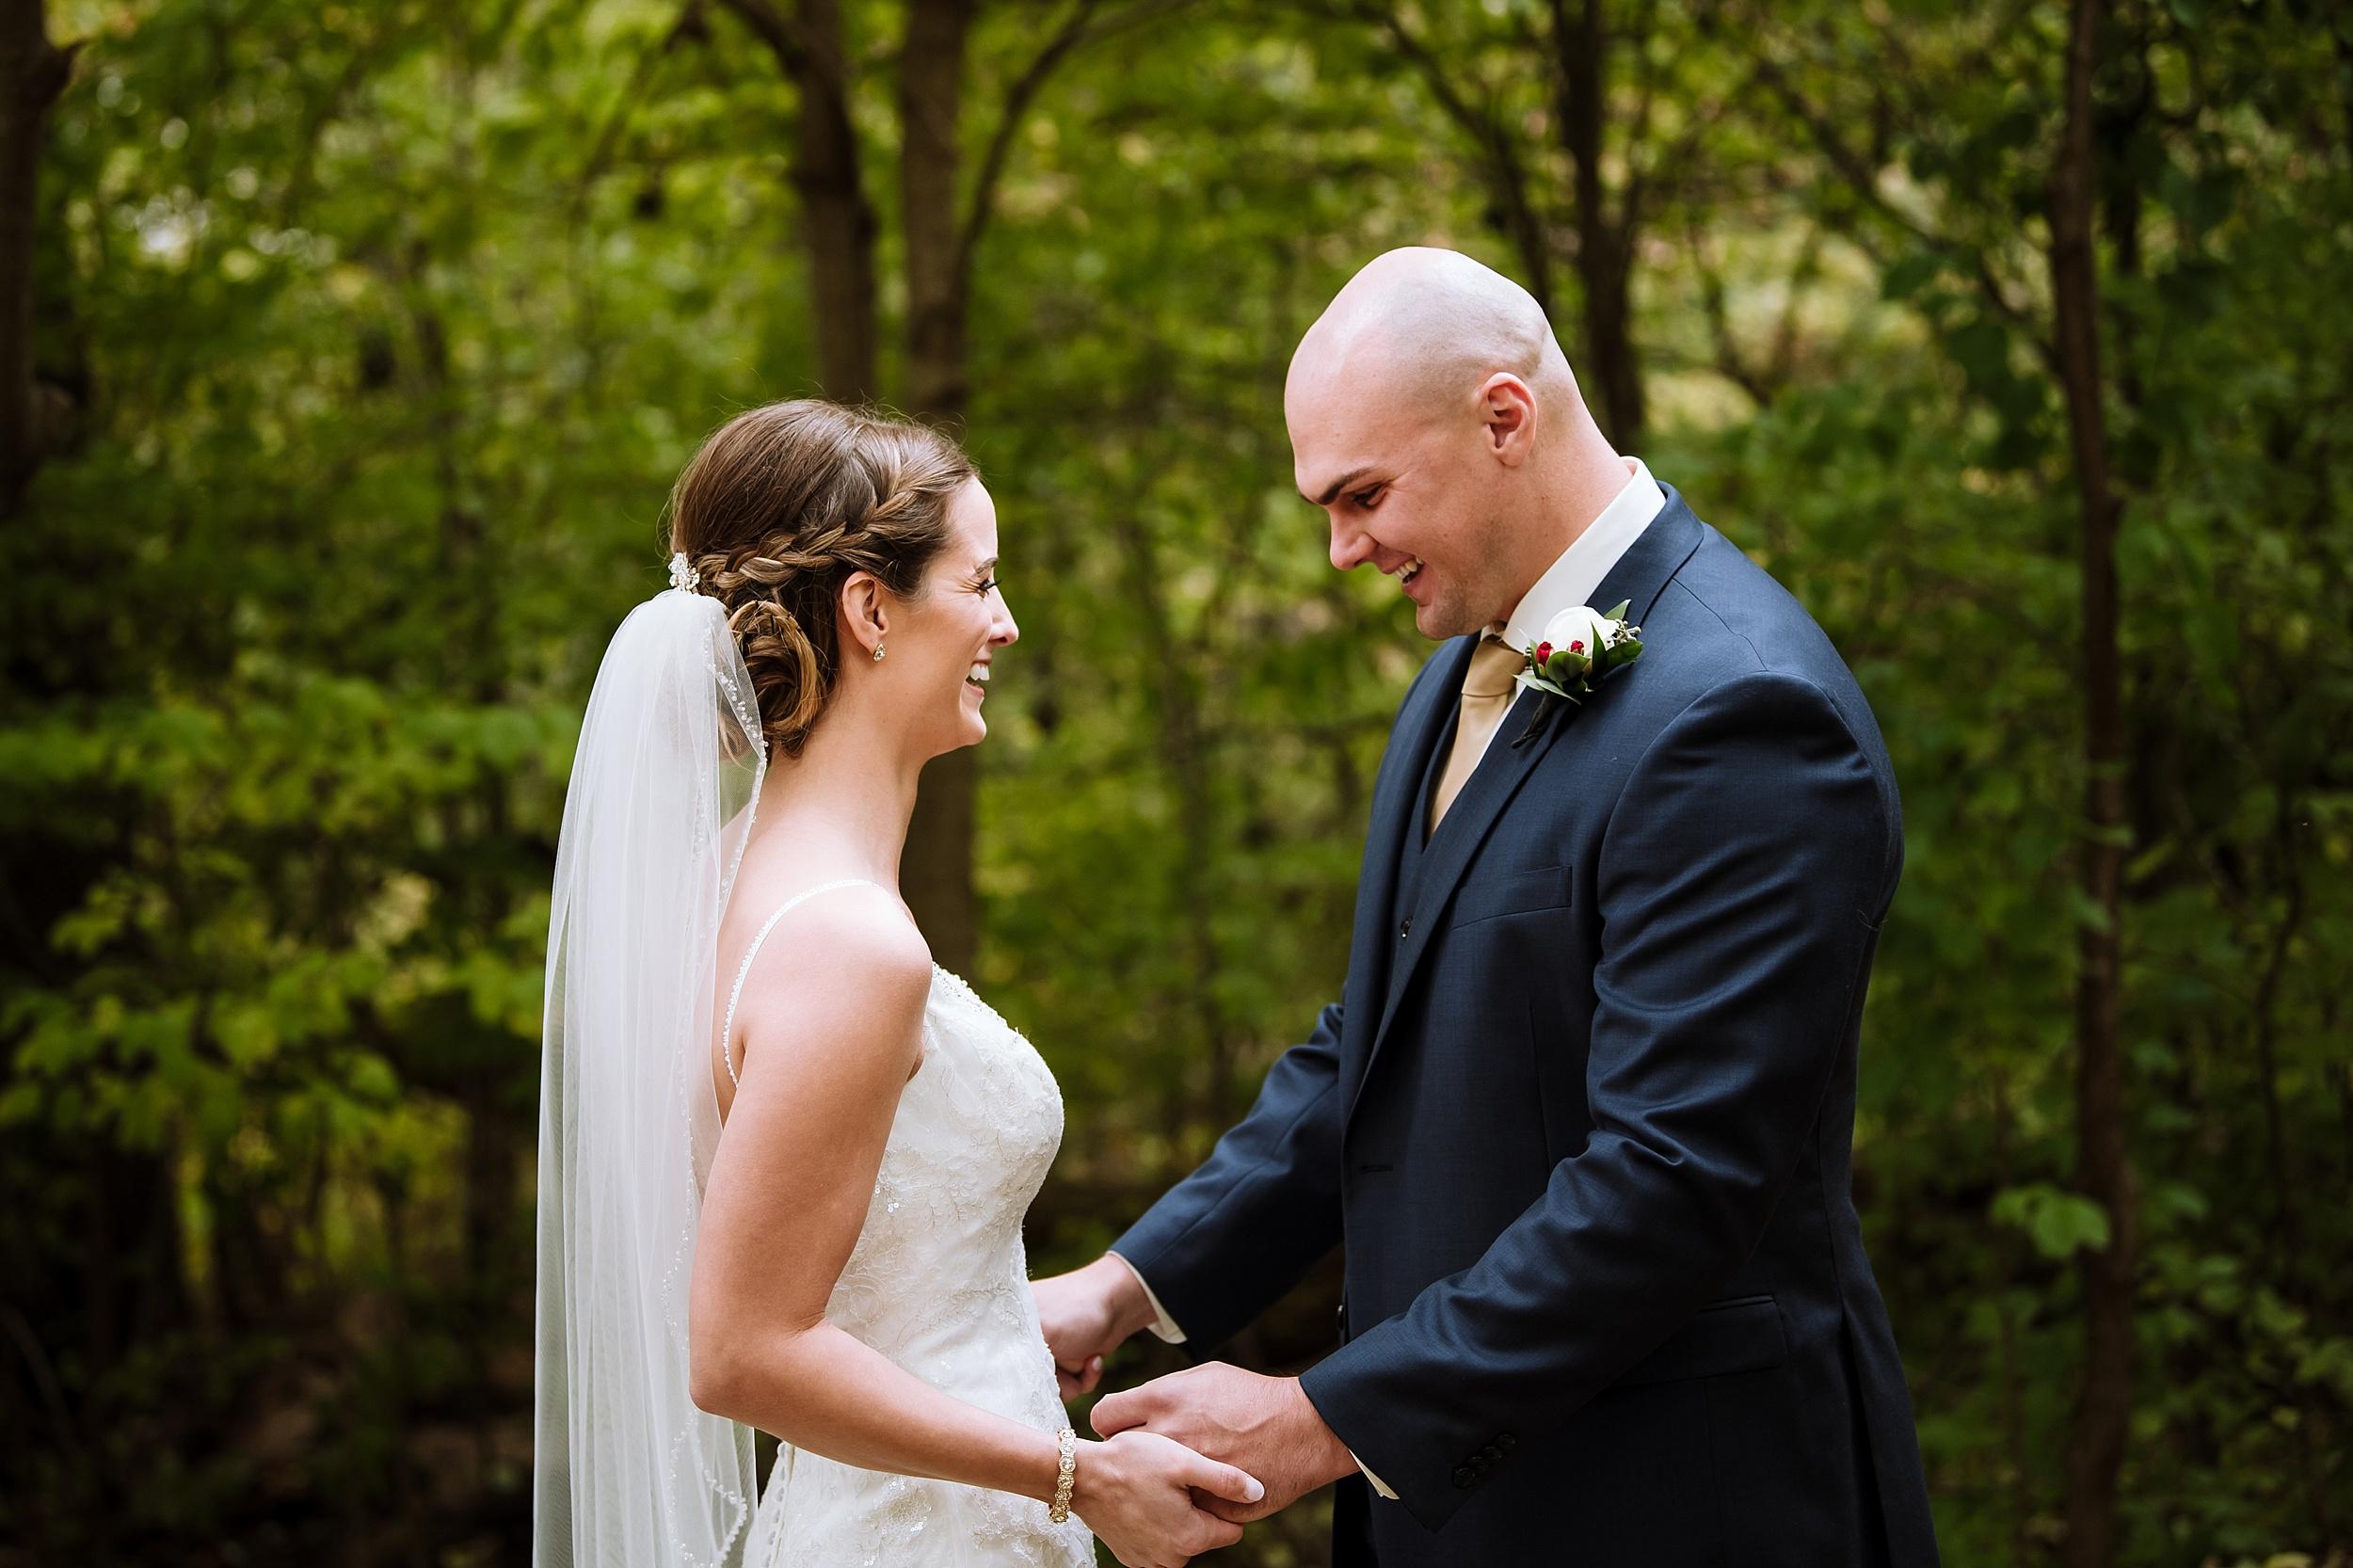 Windemere_Manor_Fall_Wedding_London_Toronto_Wedding_Photographer_0011.jpg